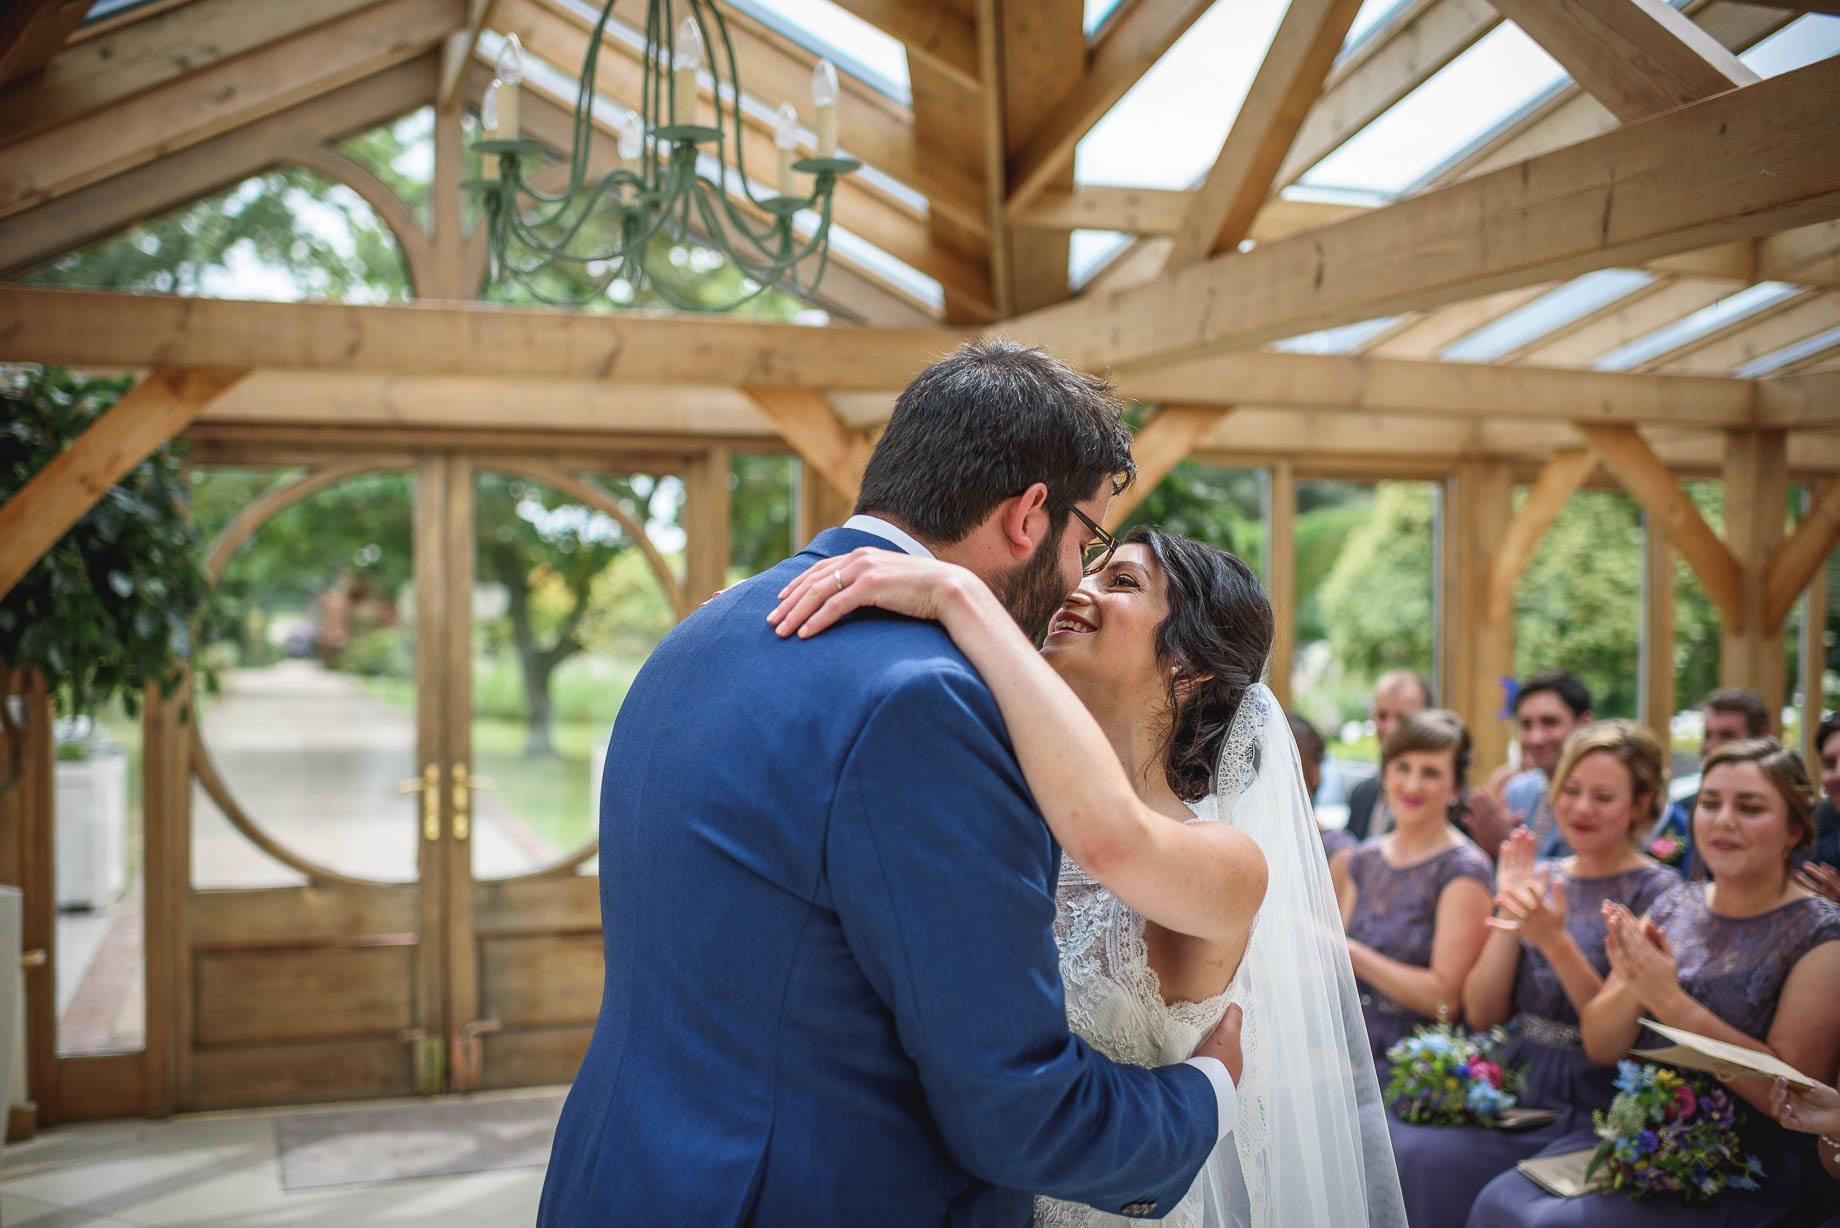 Gaynes Park wedding photography - Guy Collier Photography - Rachel and Jon (72 of 169)